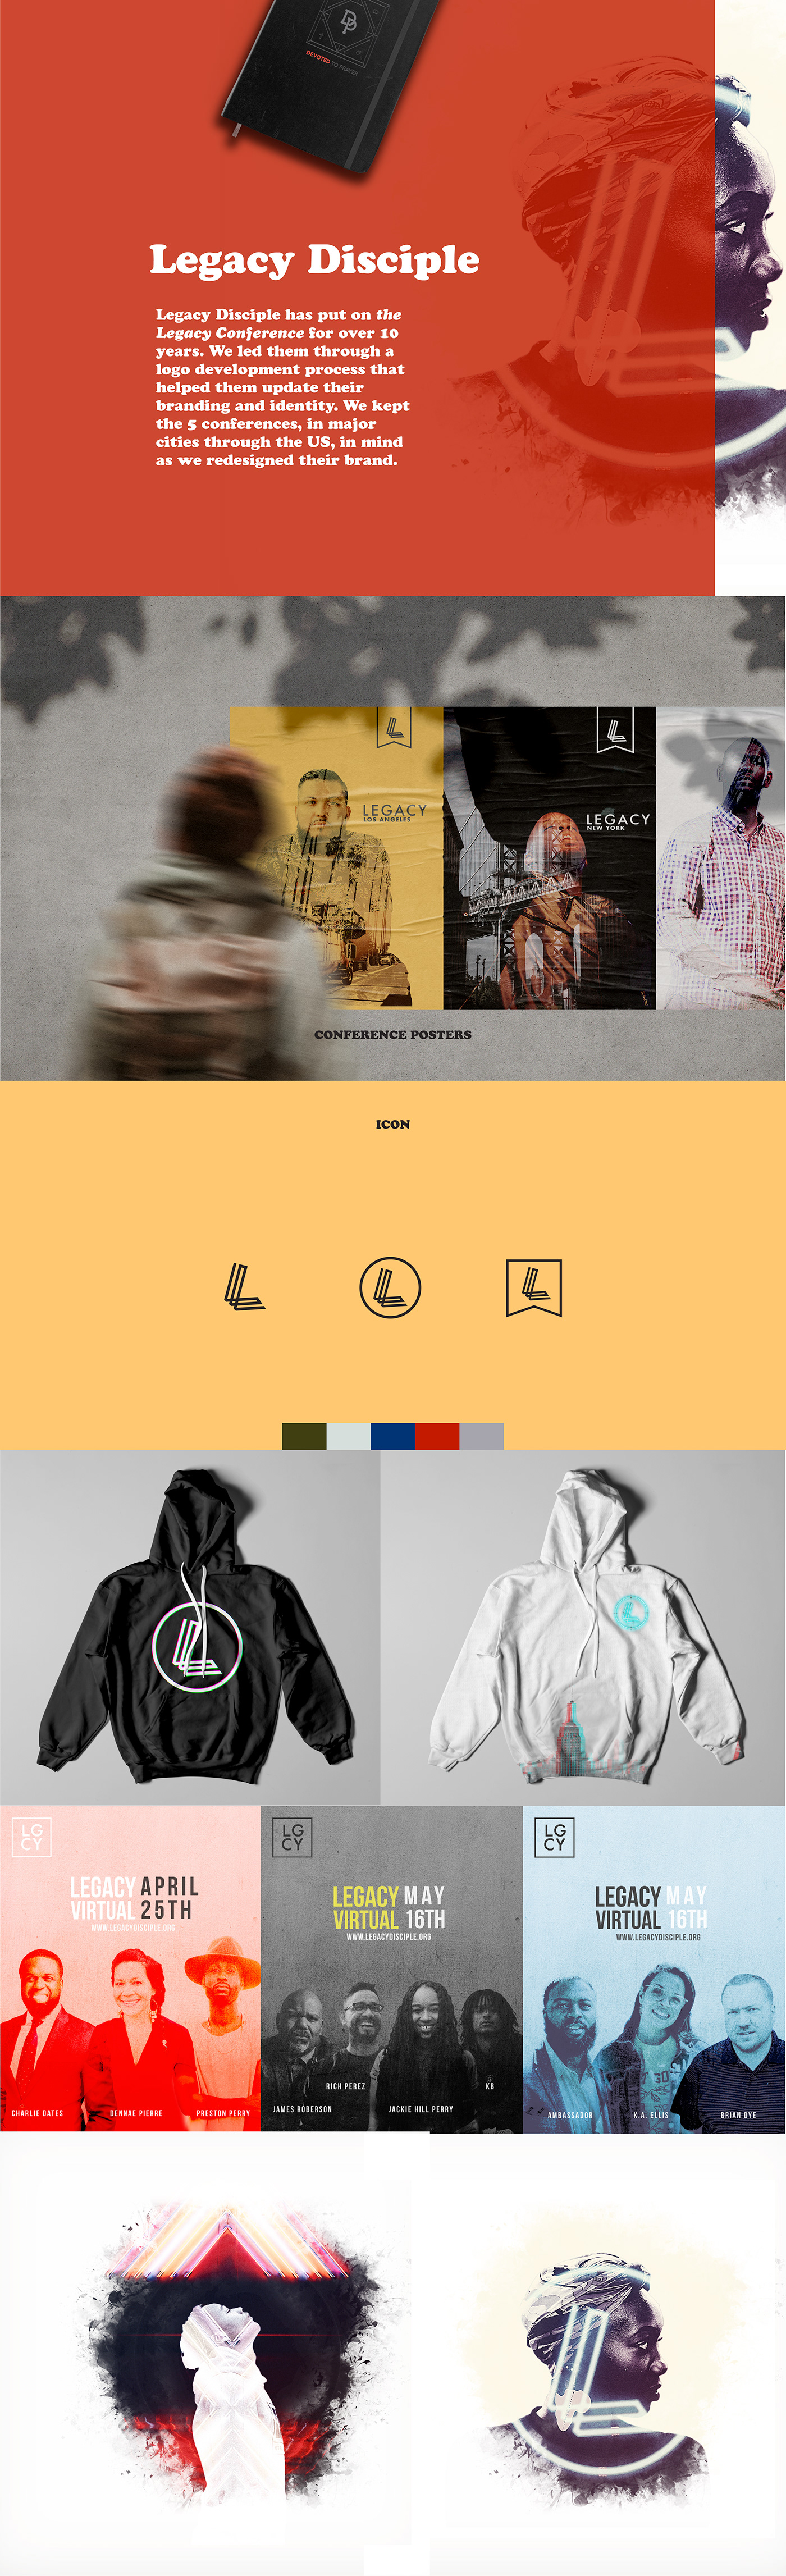 brand Christian conference design jesus Legacy Rebrand